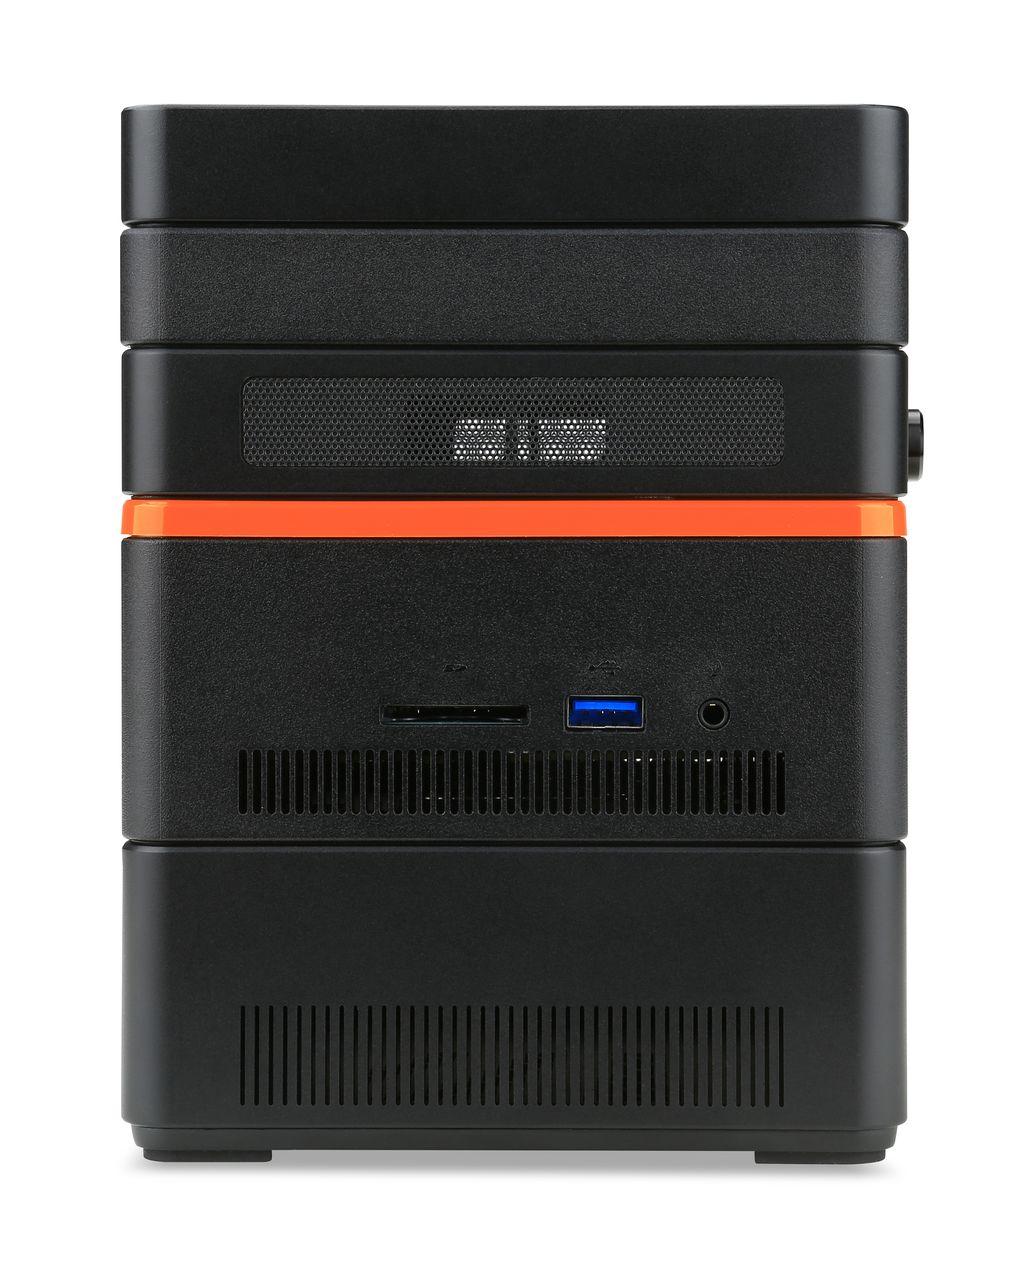 Acer Revo Build Series 600 06